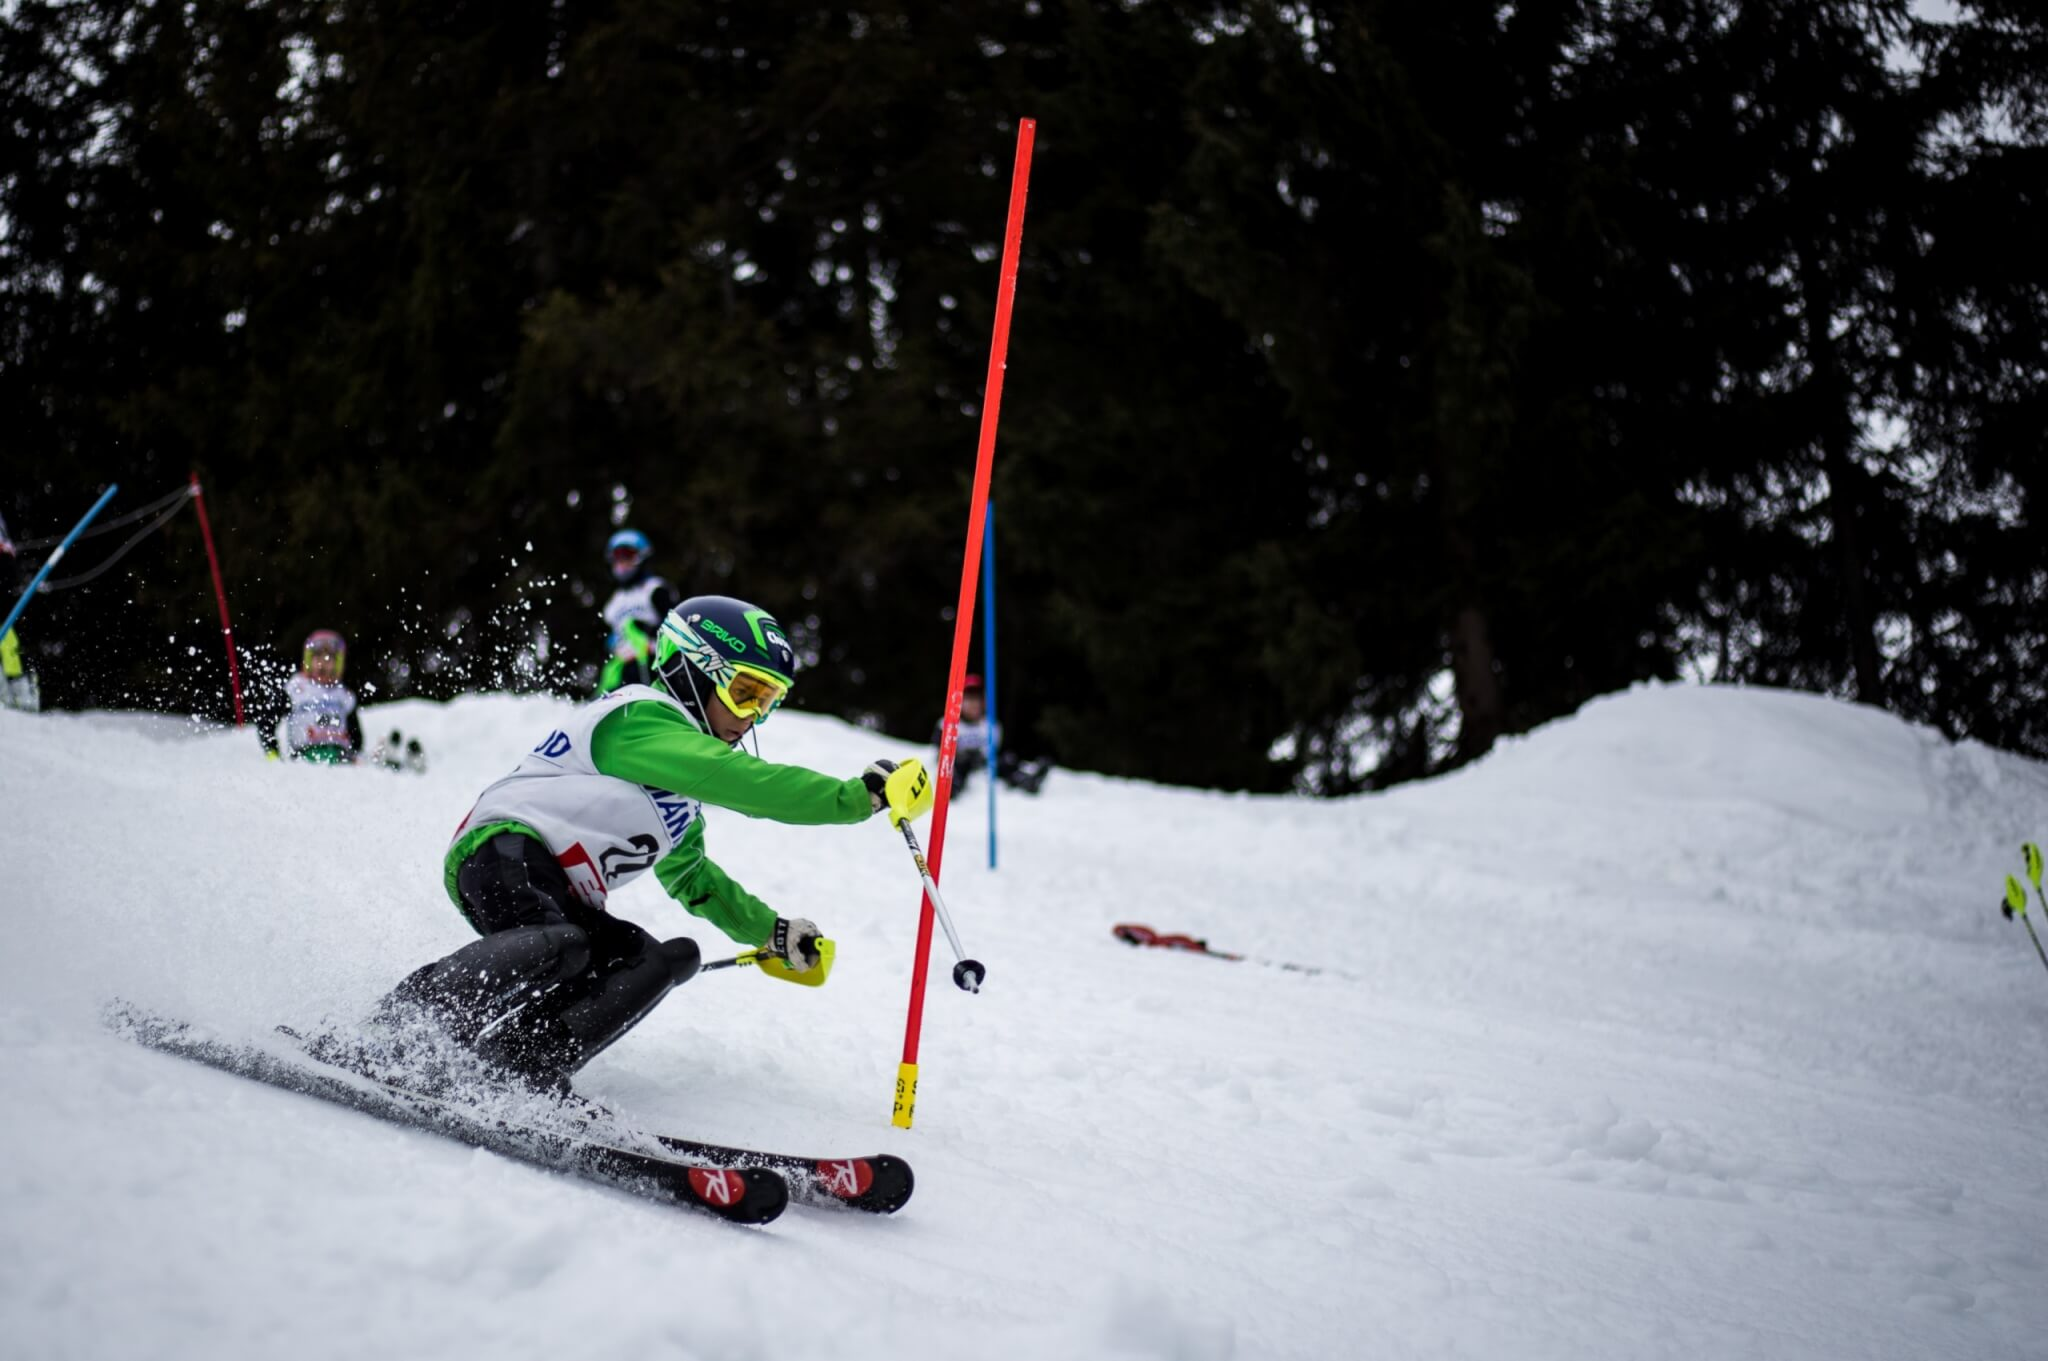 Dečak skija na planini i zaobilazi zastavicu